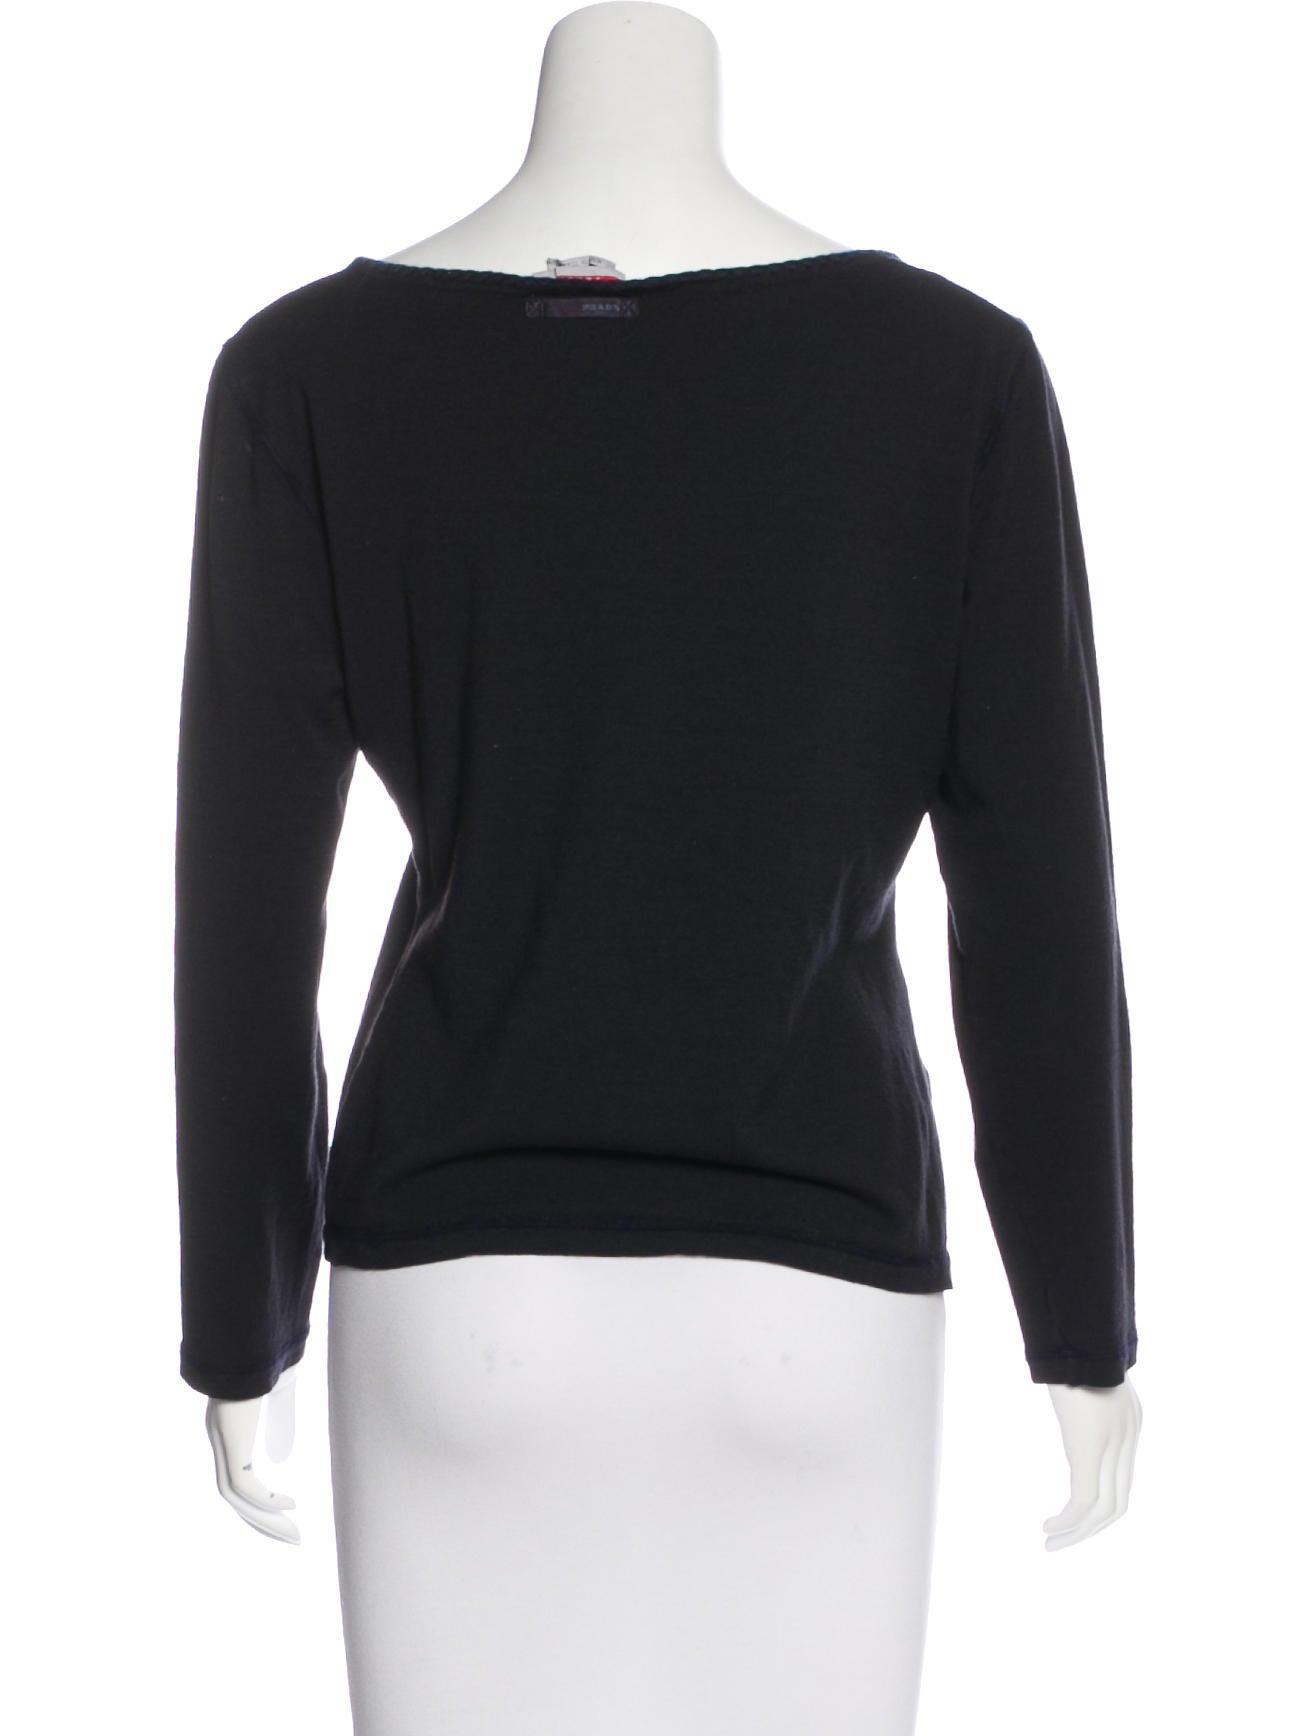 Prada sport wool long sleeve top clothing wpr43994 for Best wool shirt jackets